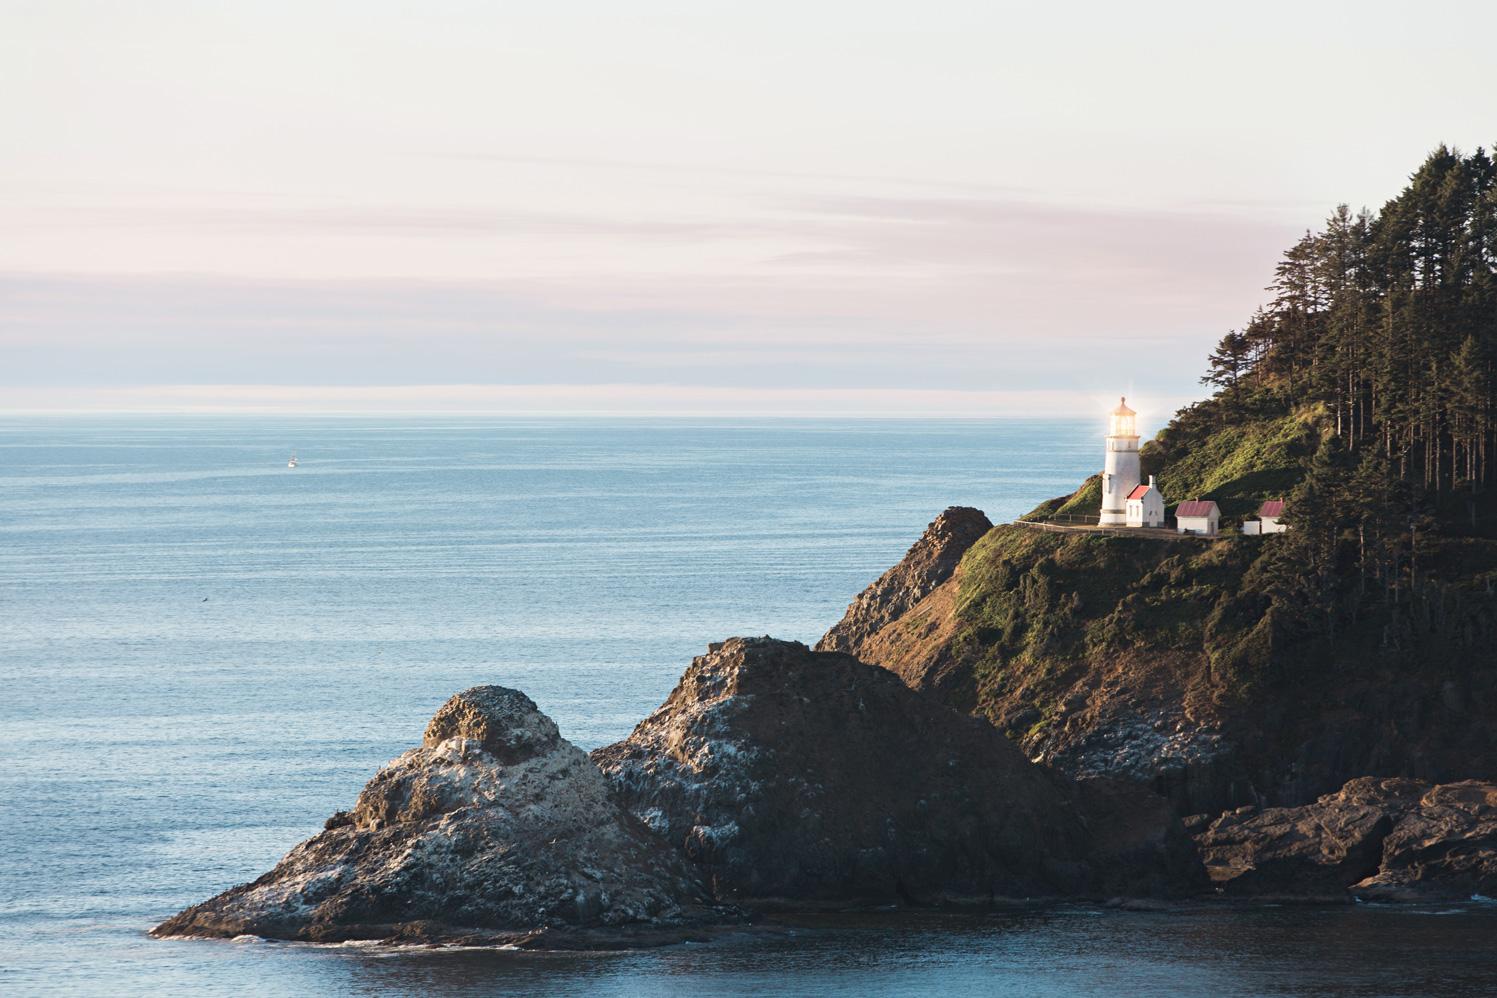 CindyGiovagnoli_Crater_Lake_National_Park_Cape_Perpetua_Heceta_Head_lighthouse_Pacific_Ocean_Cannon_Beach_haystack_Oregon_coast-002.jpg